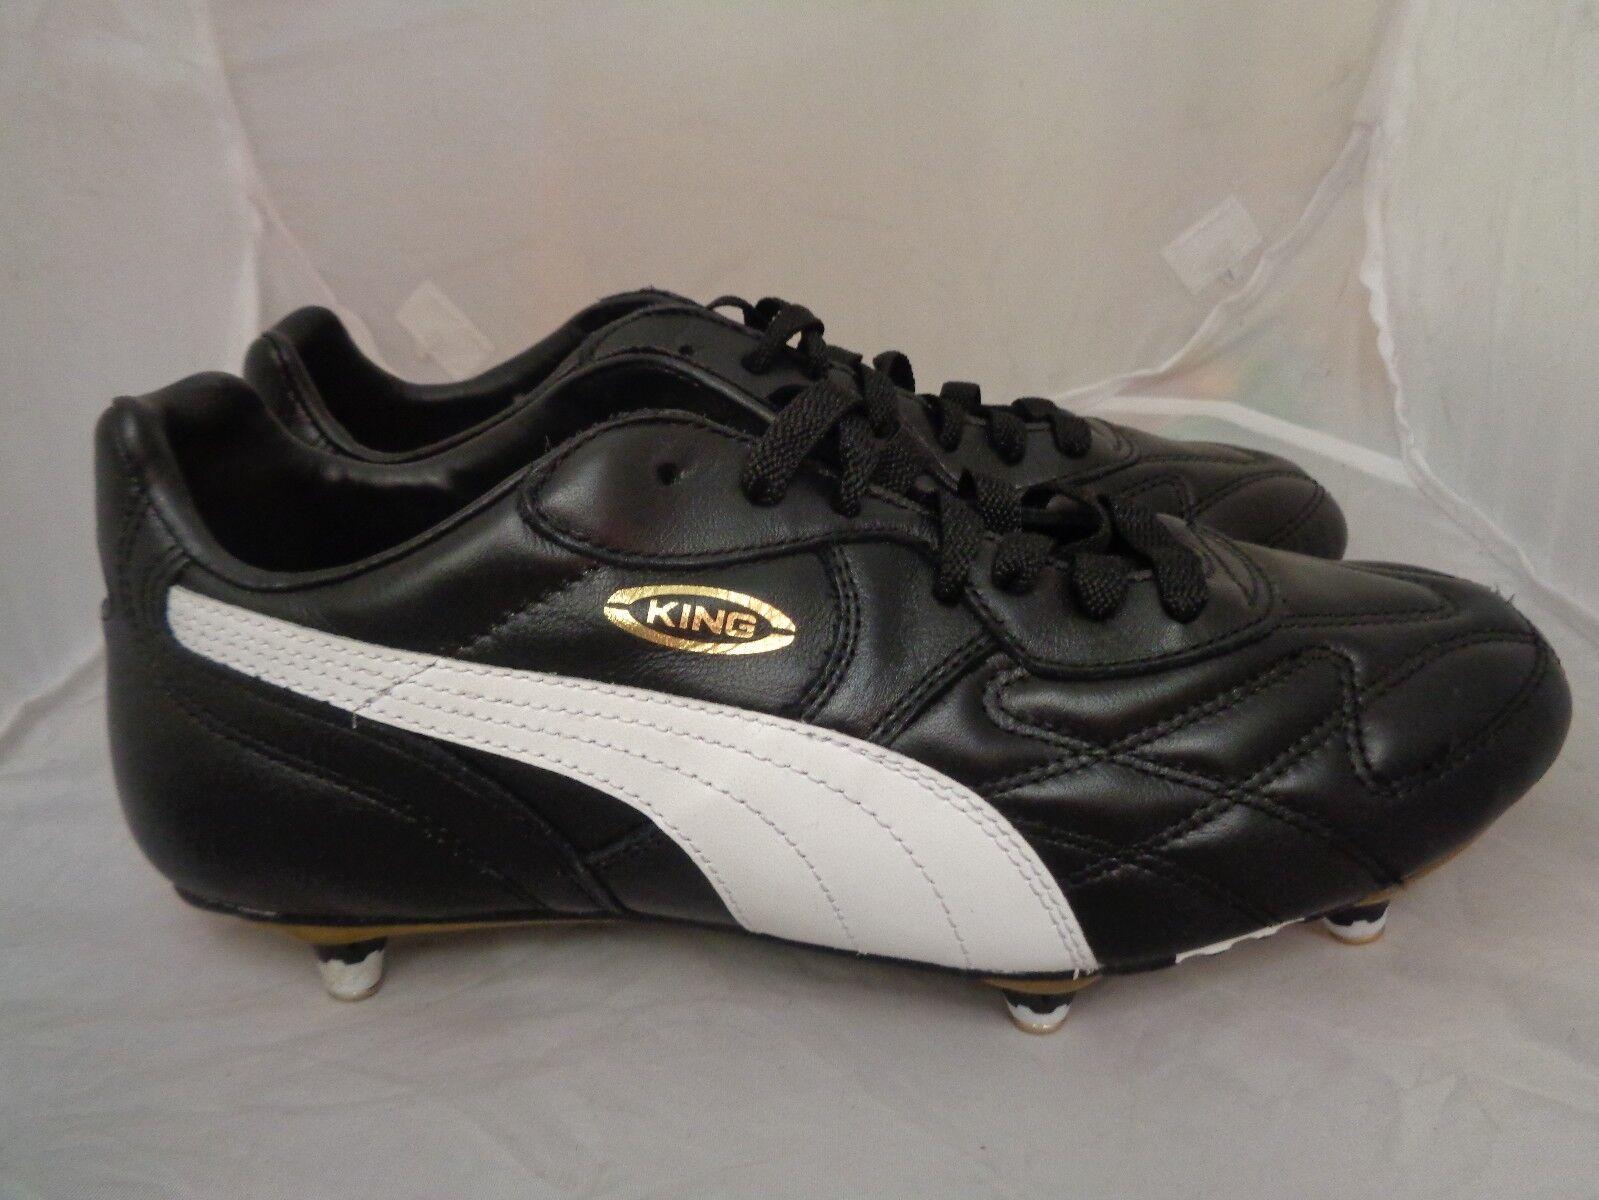 Puma Re pro Sg Uomo Scarpe da Calcio Us 7 Ref Eur 39 Cm 25 Ref 7 5637 ^ 82b13d